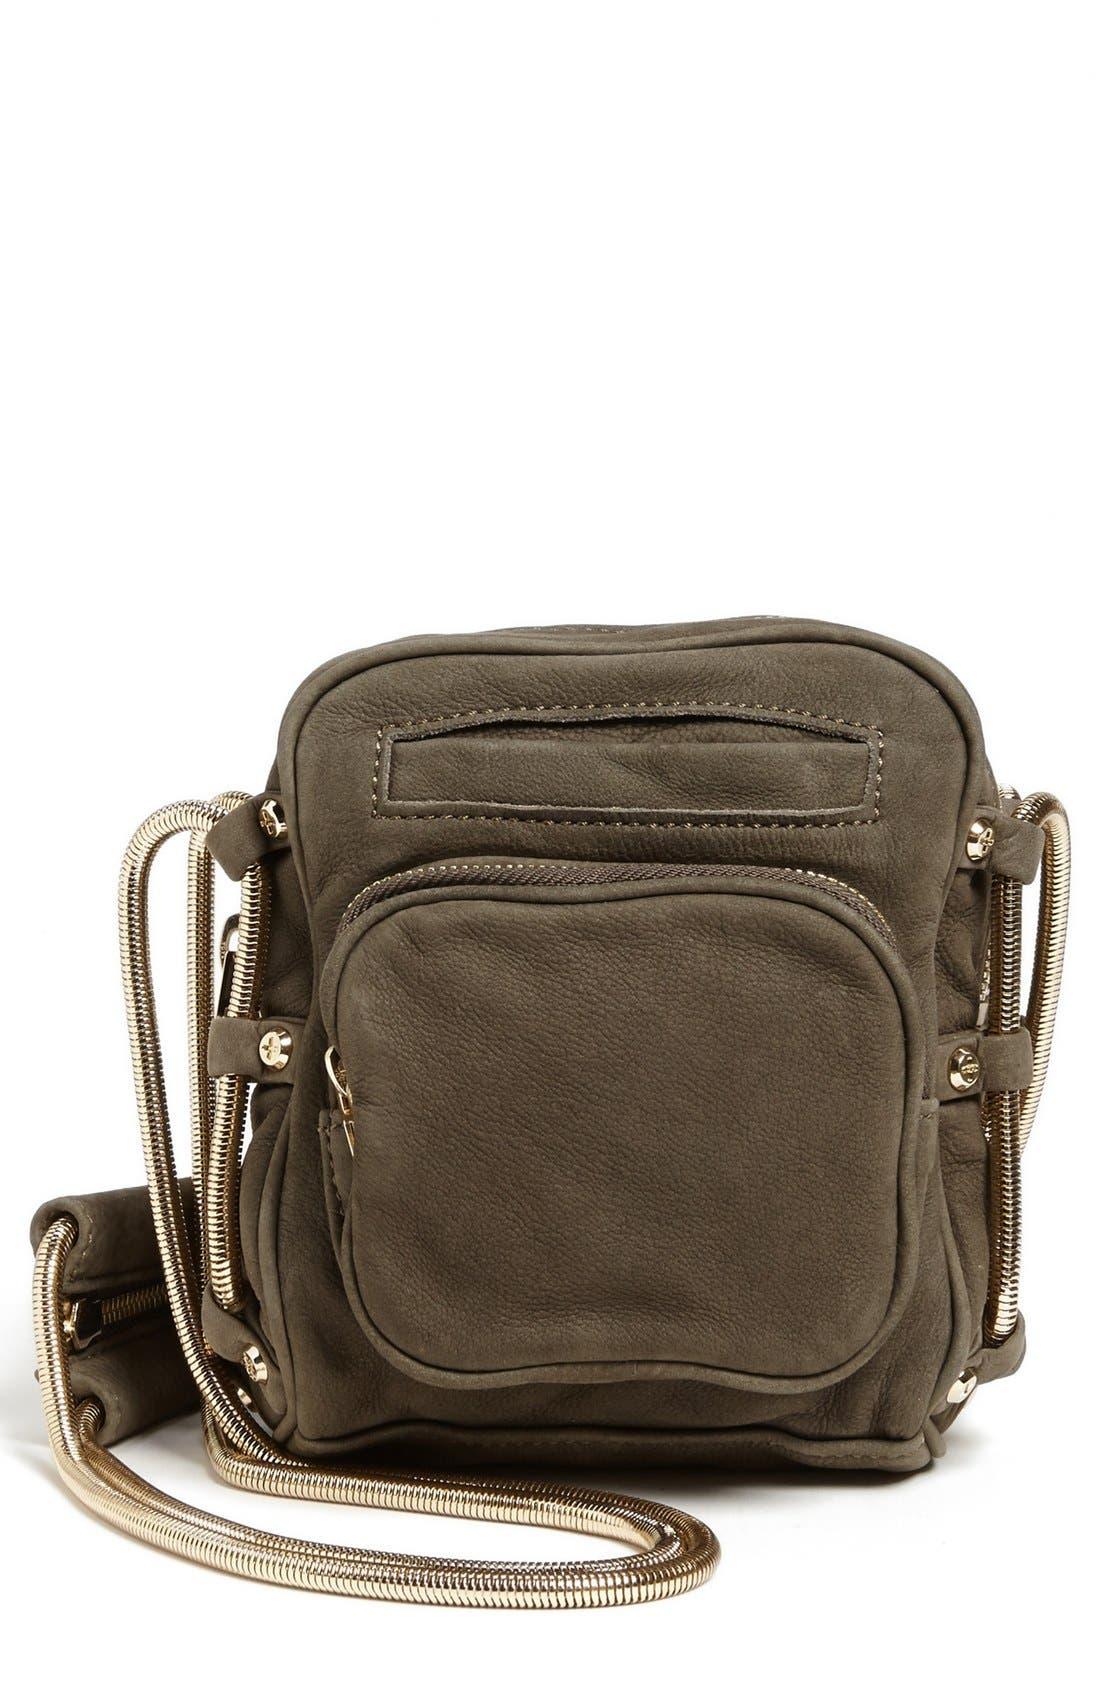 Alternate Image 1 Selected - Alexander Wang 'Brenda - Pale Gold' Nubuck Leather Shoulder Bag, Small